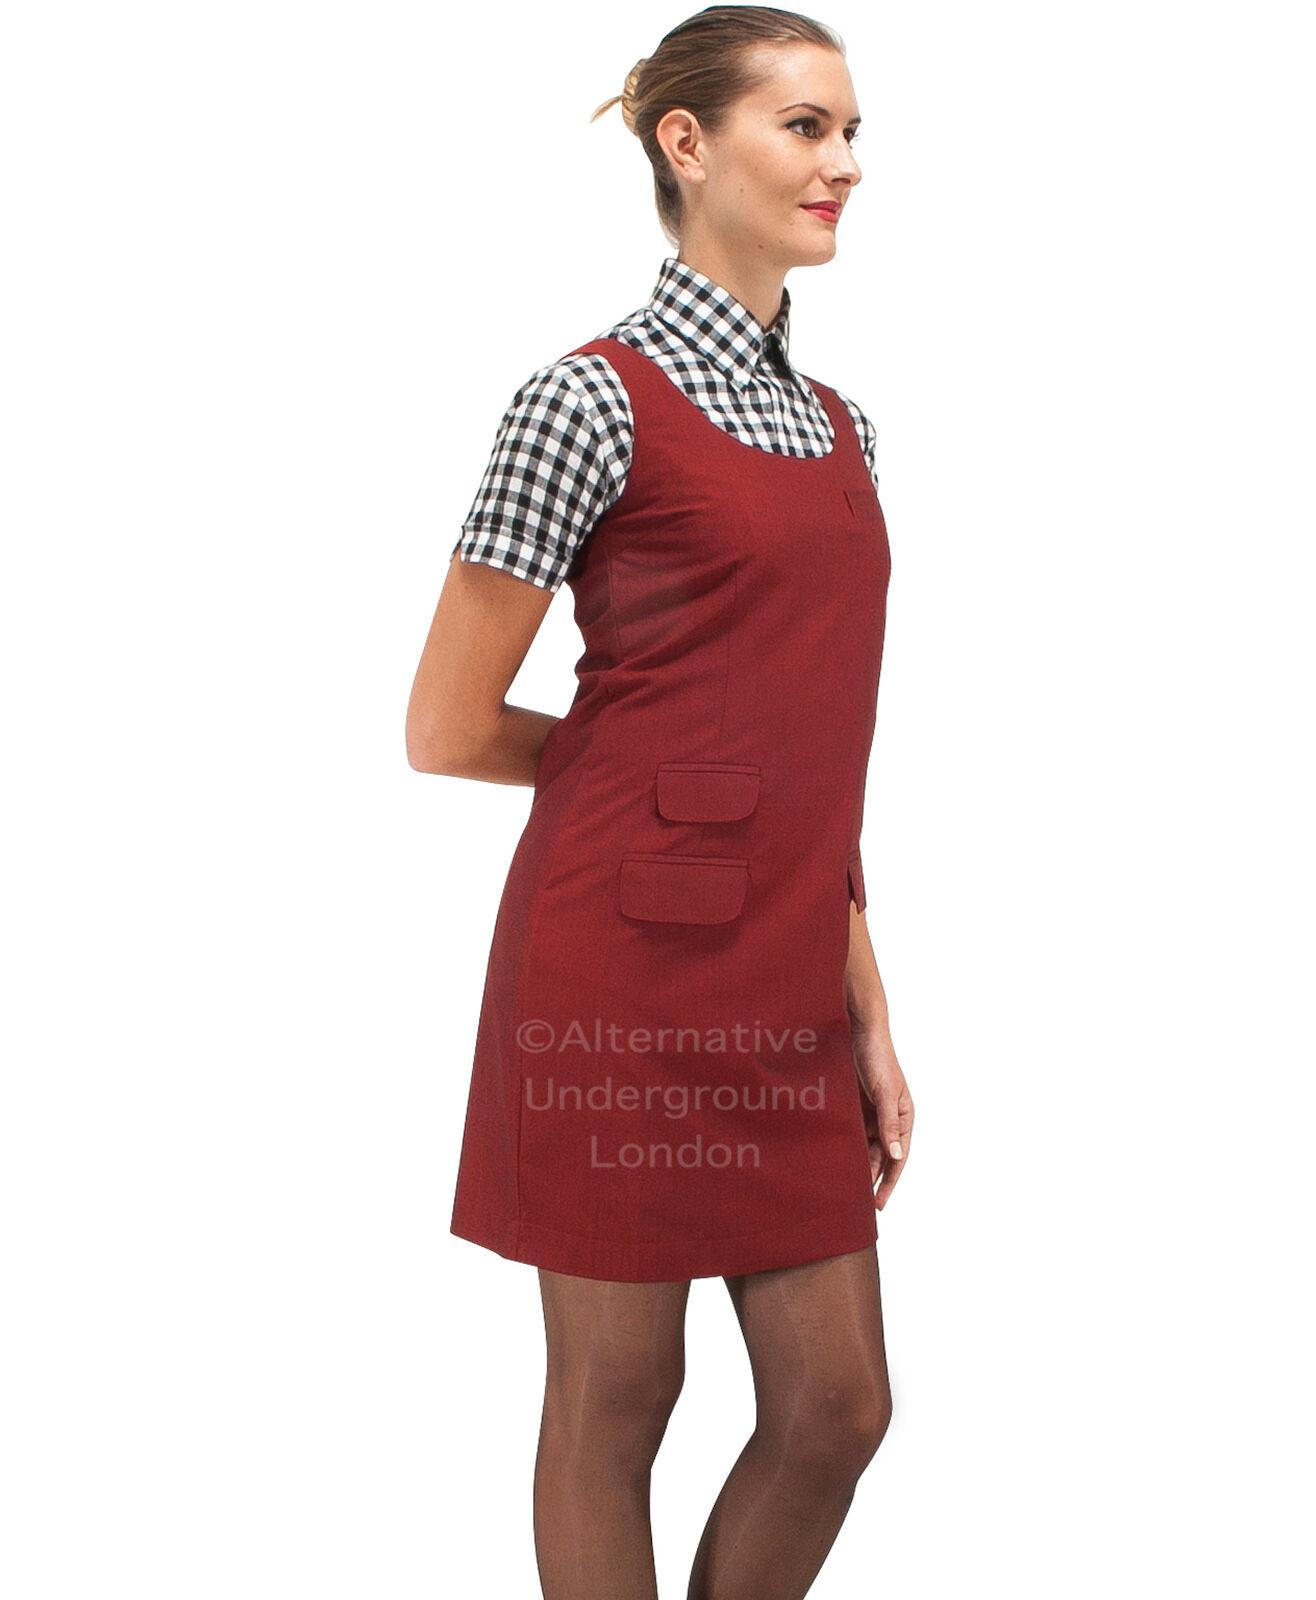 Relco LINEA DONNA Borgogna TONIC due toni Pinafore Pinafore Pinafore DRESS 60s Mod Skin Ska skinbryd d7cedf